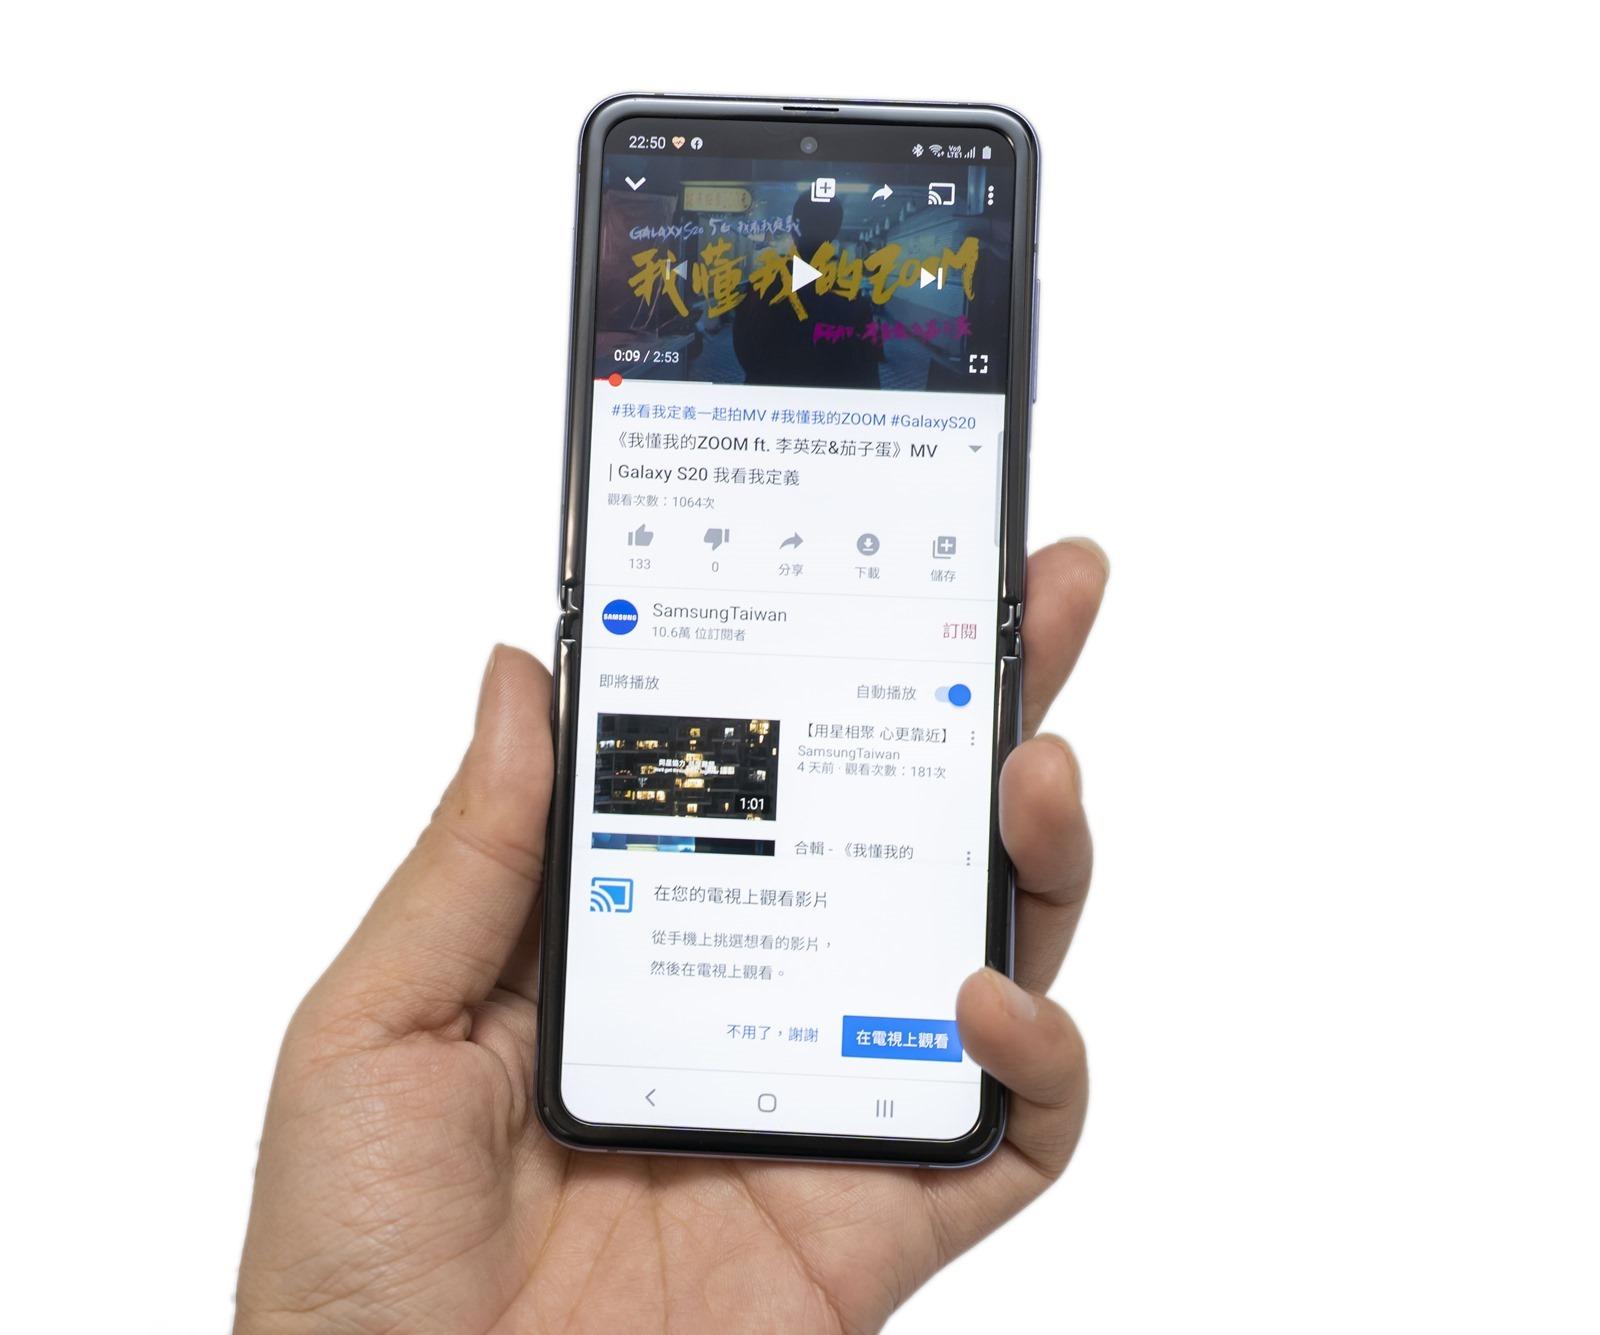 Youtube APP 更新支援 ZFlip 折疊機螢幕分割模式 @3C 達人廖阿輝